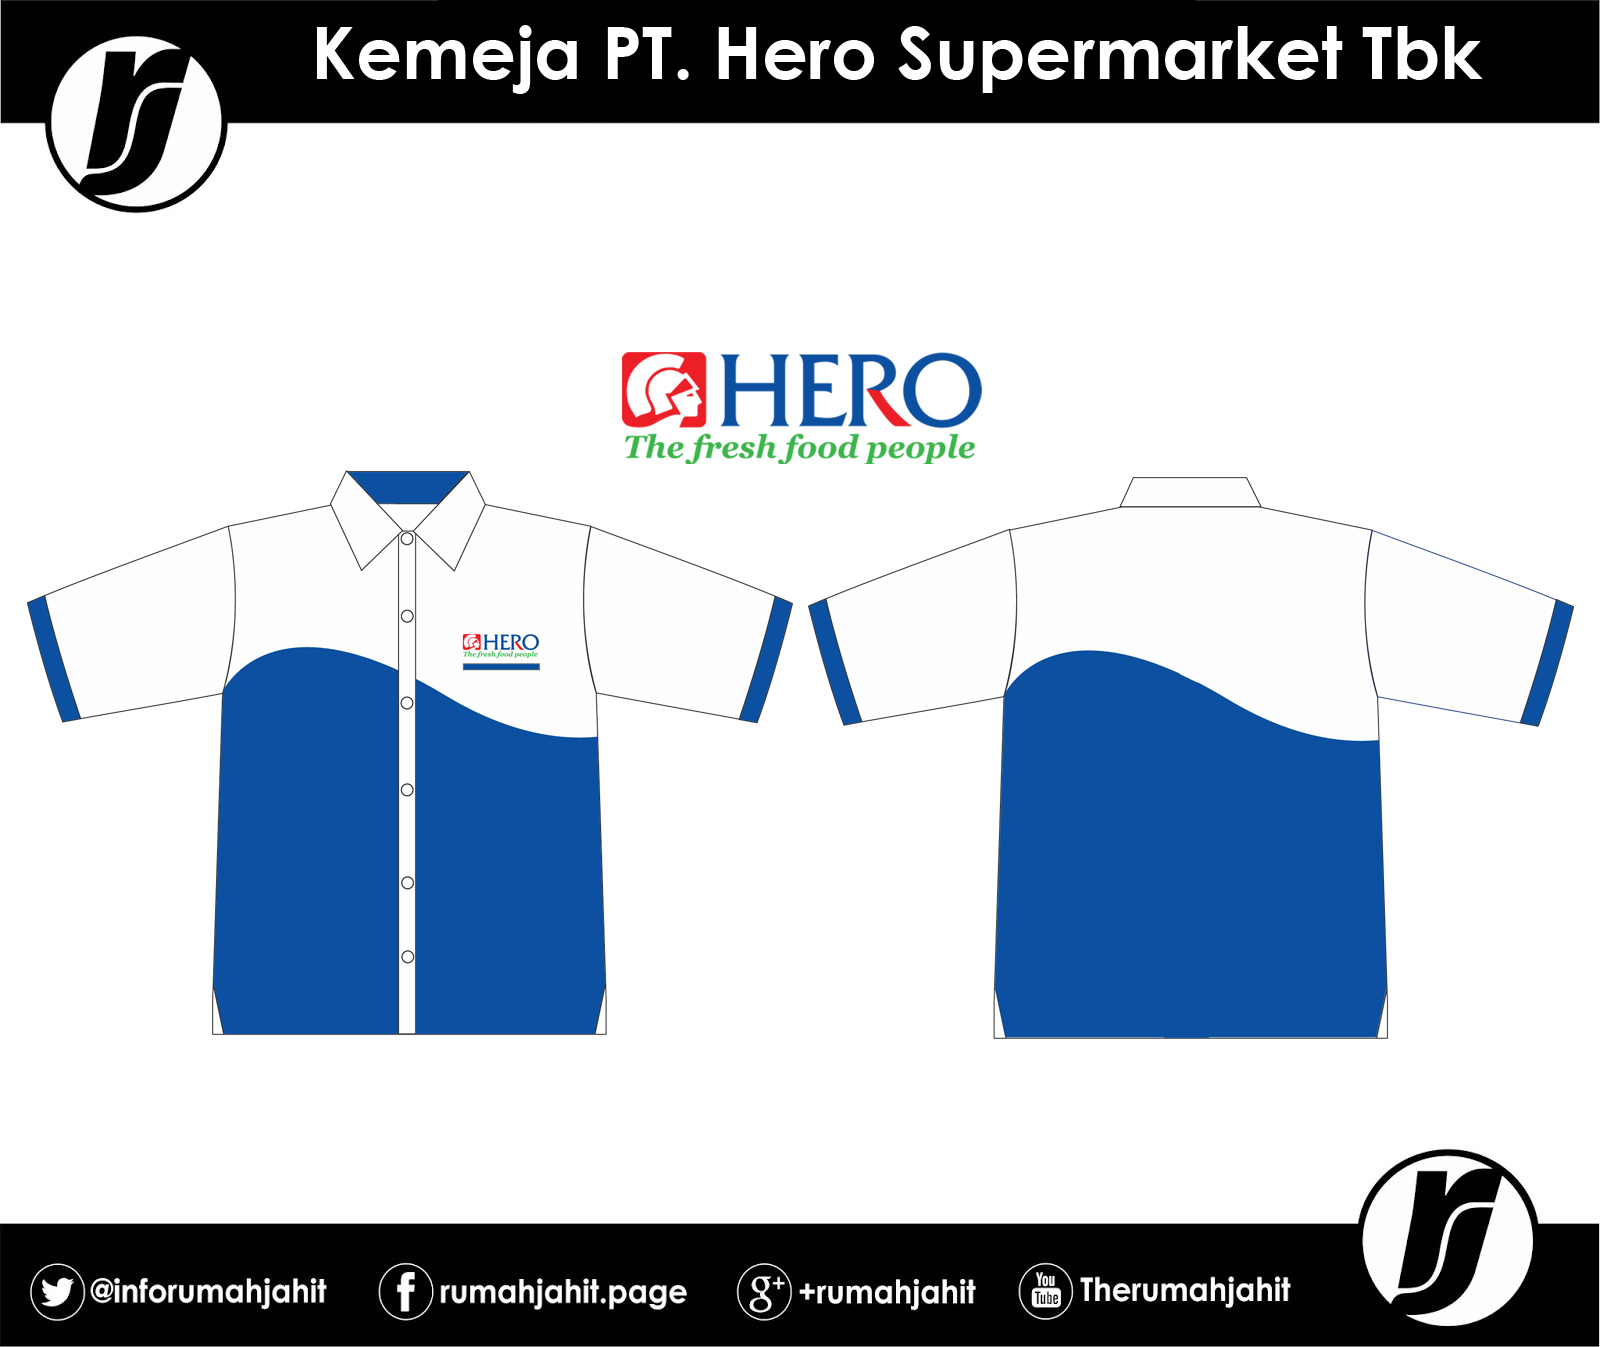 kemeja pt hero supermarket tbk mitra pengadaan seragam